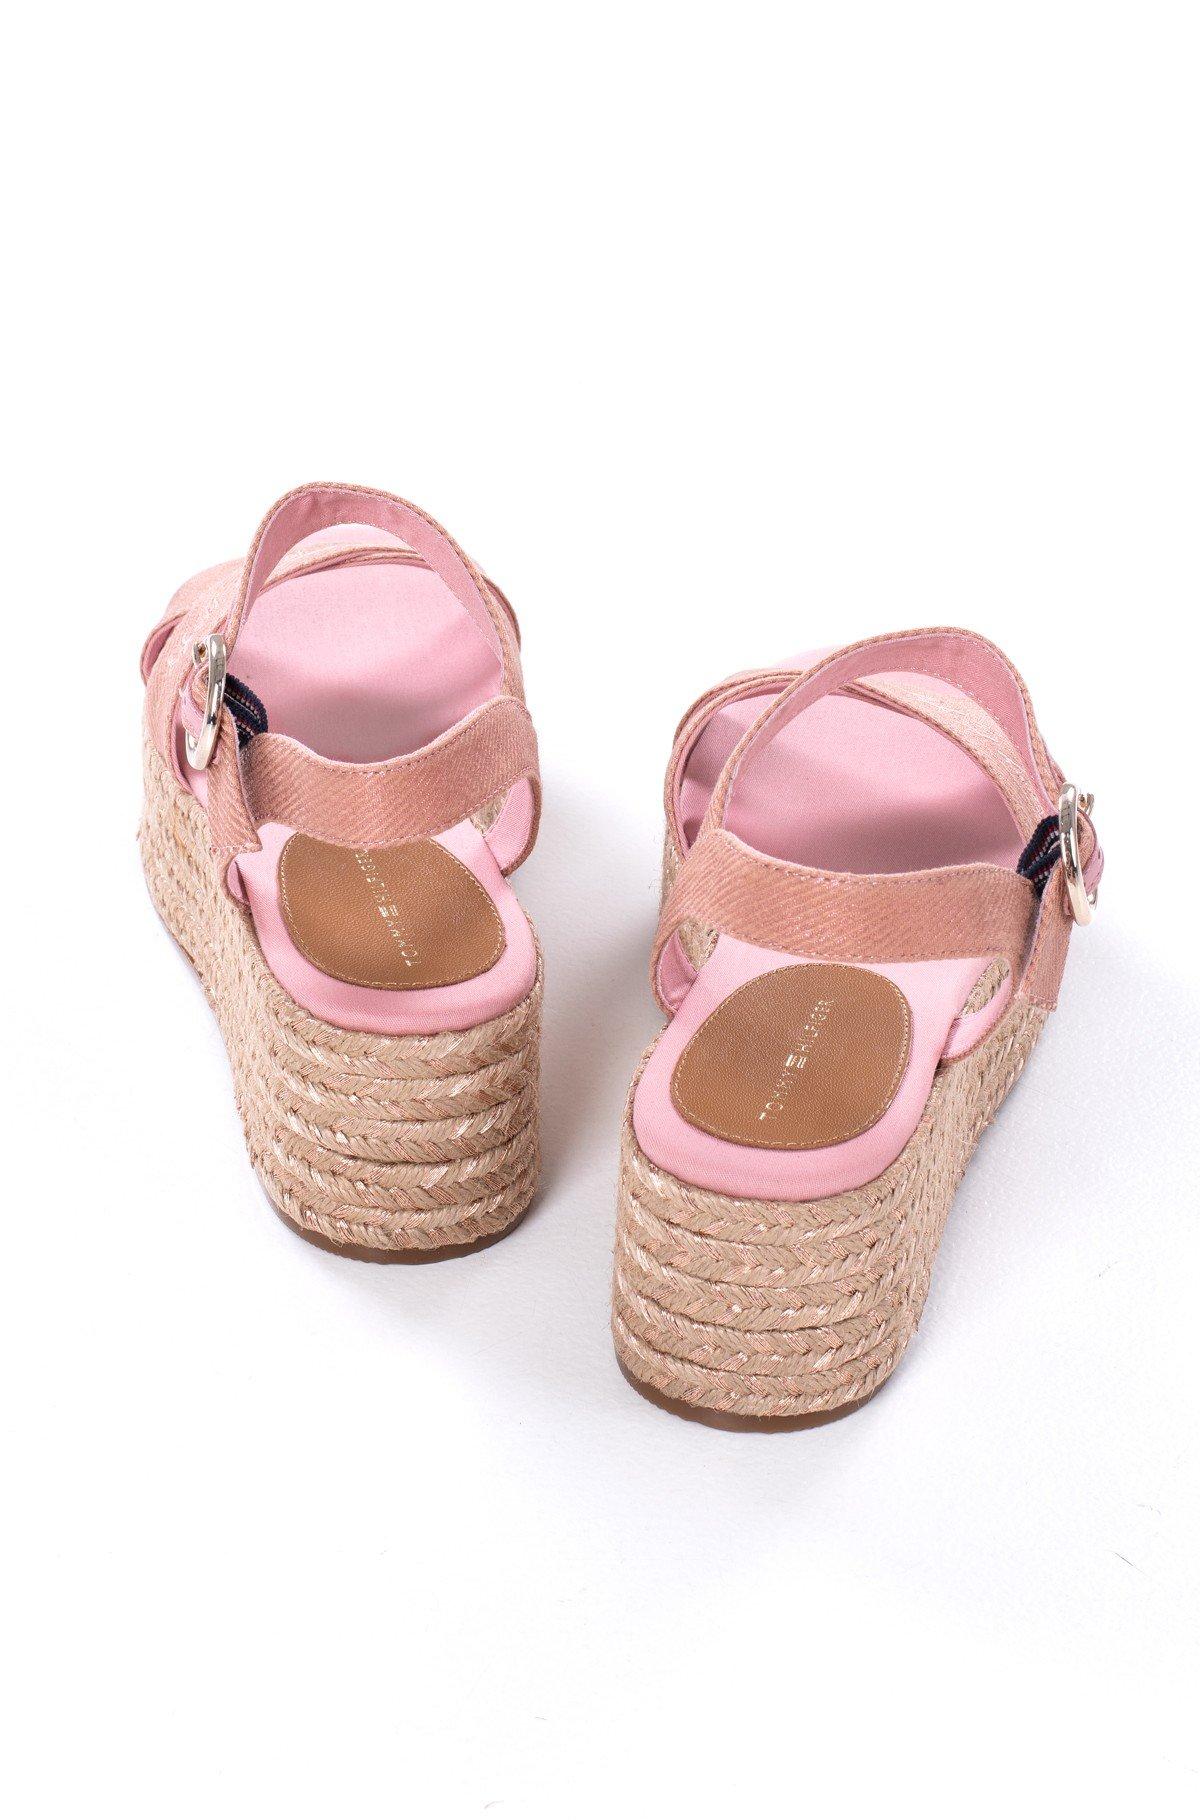 Platform shoes TH SIGNATURE FLATFORM SANDAL-full-3